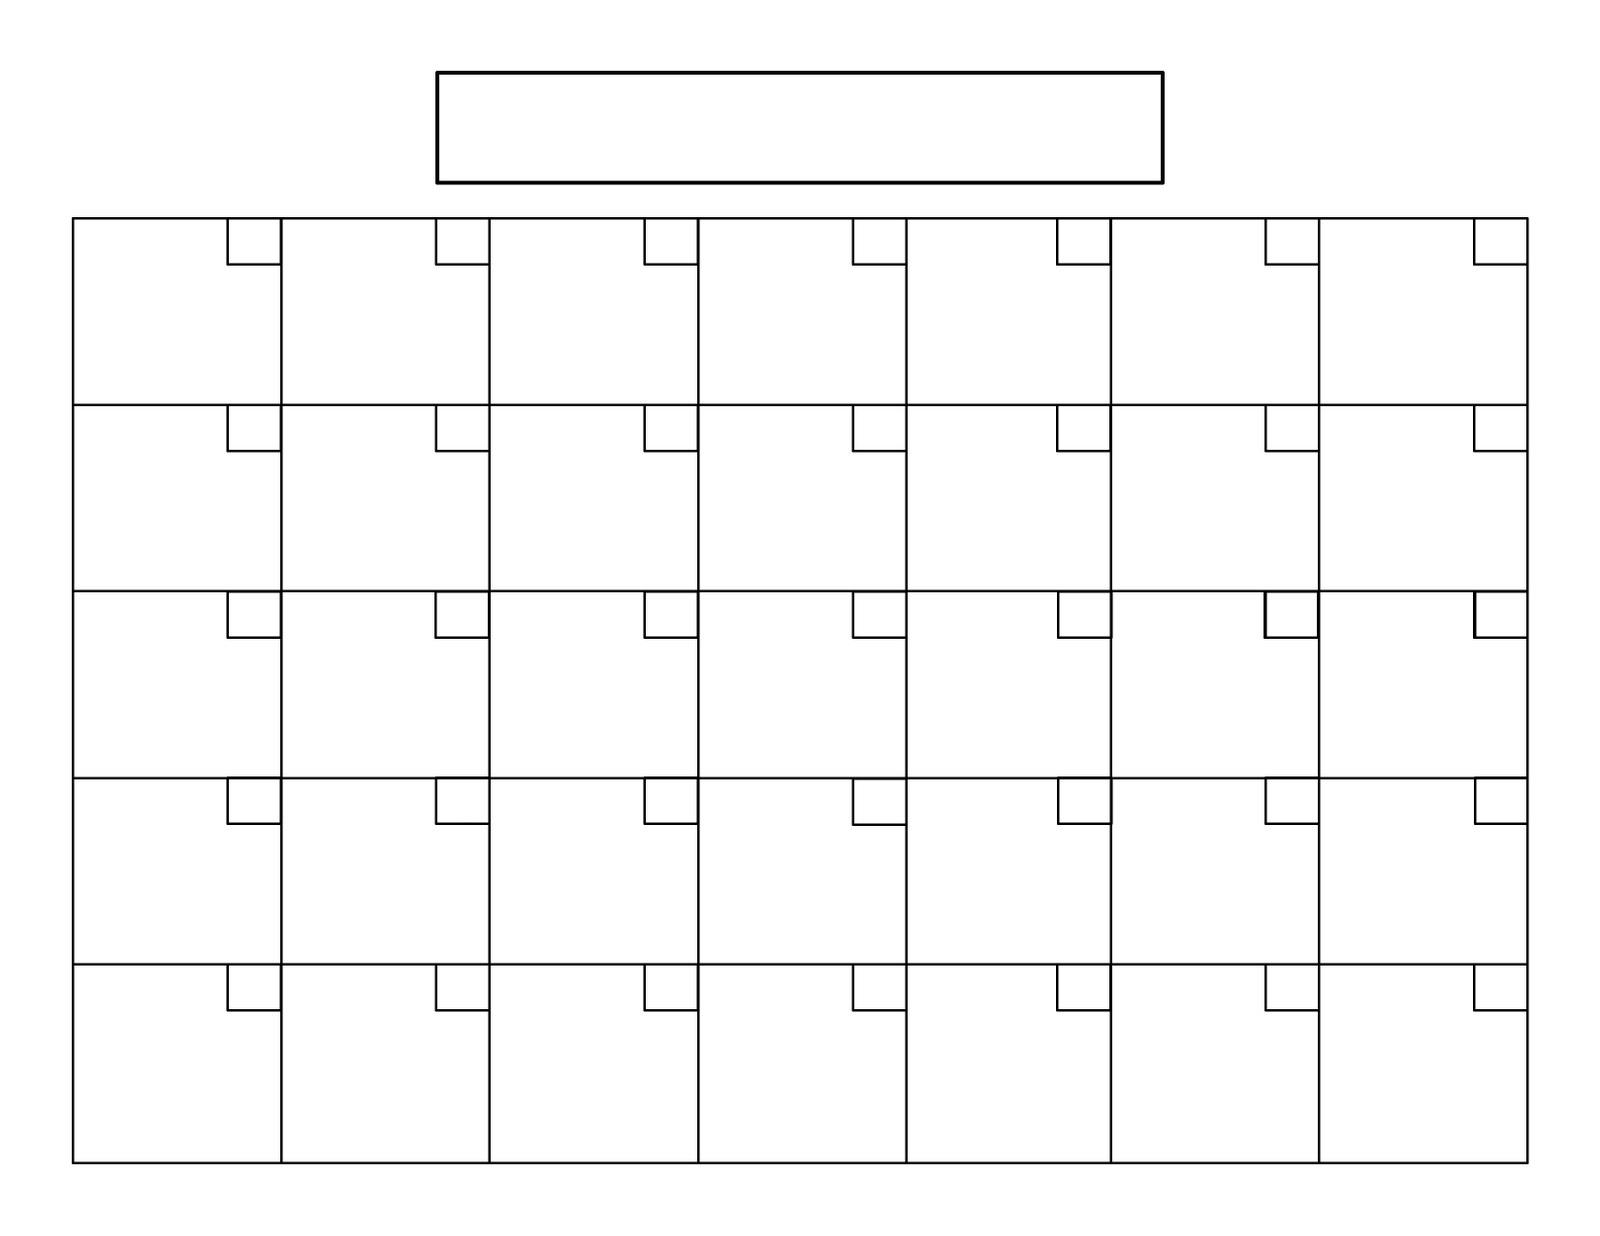 16 Simple Blank Calendar Template Images - Full Size Blank regarding 8.5 X 11 Calendar Template